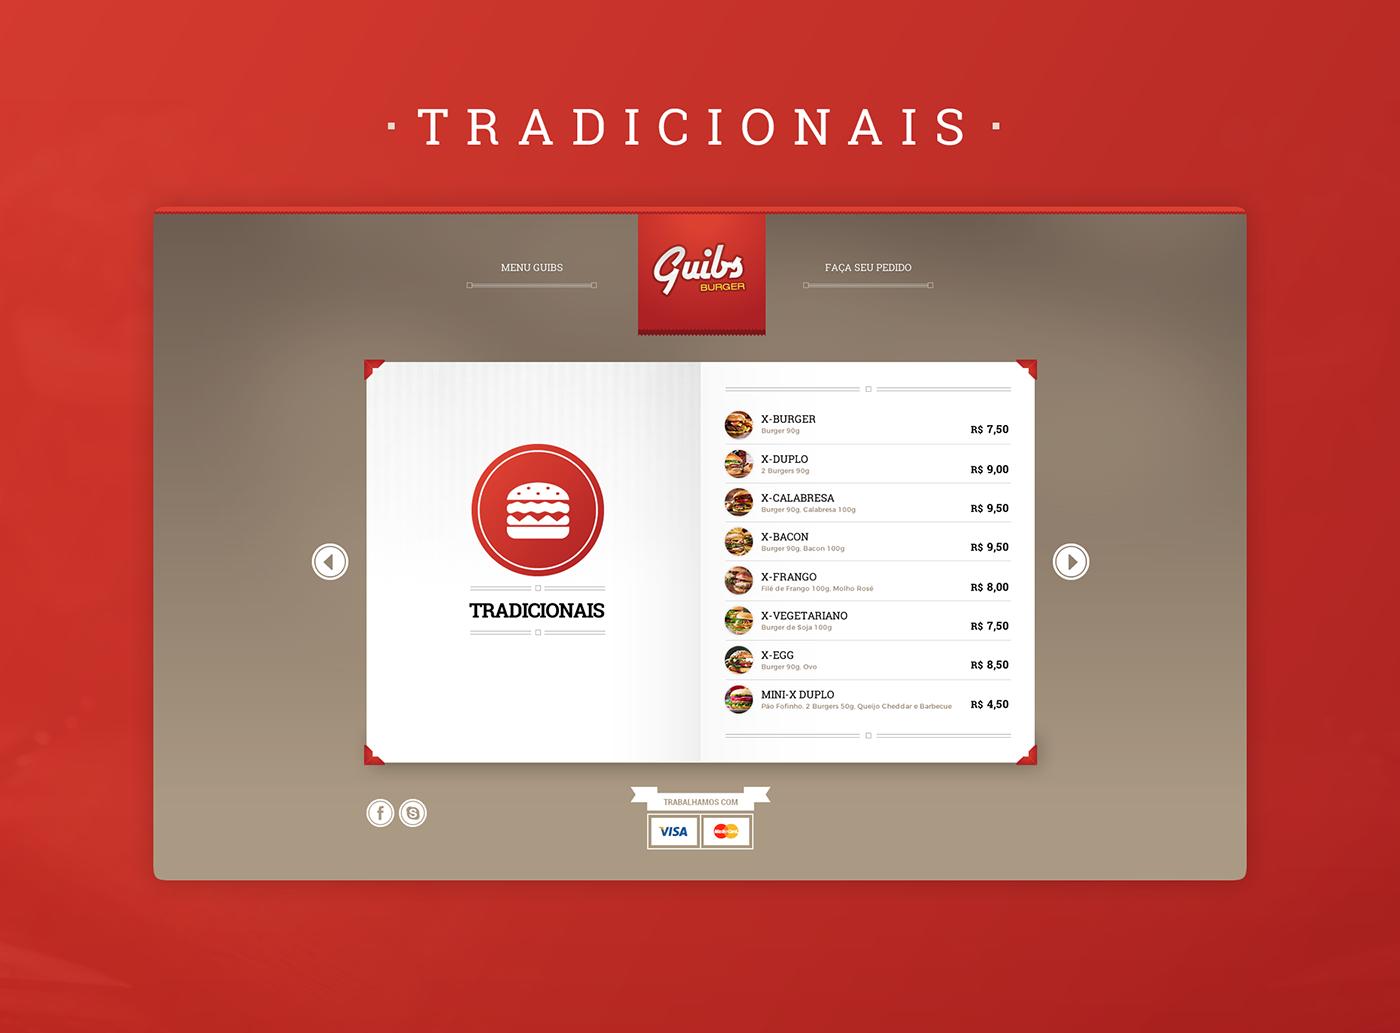 guibs burger eduardo garcia Webdesign menu Food  red hamburber